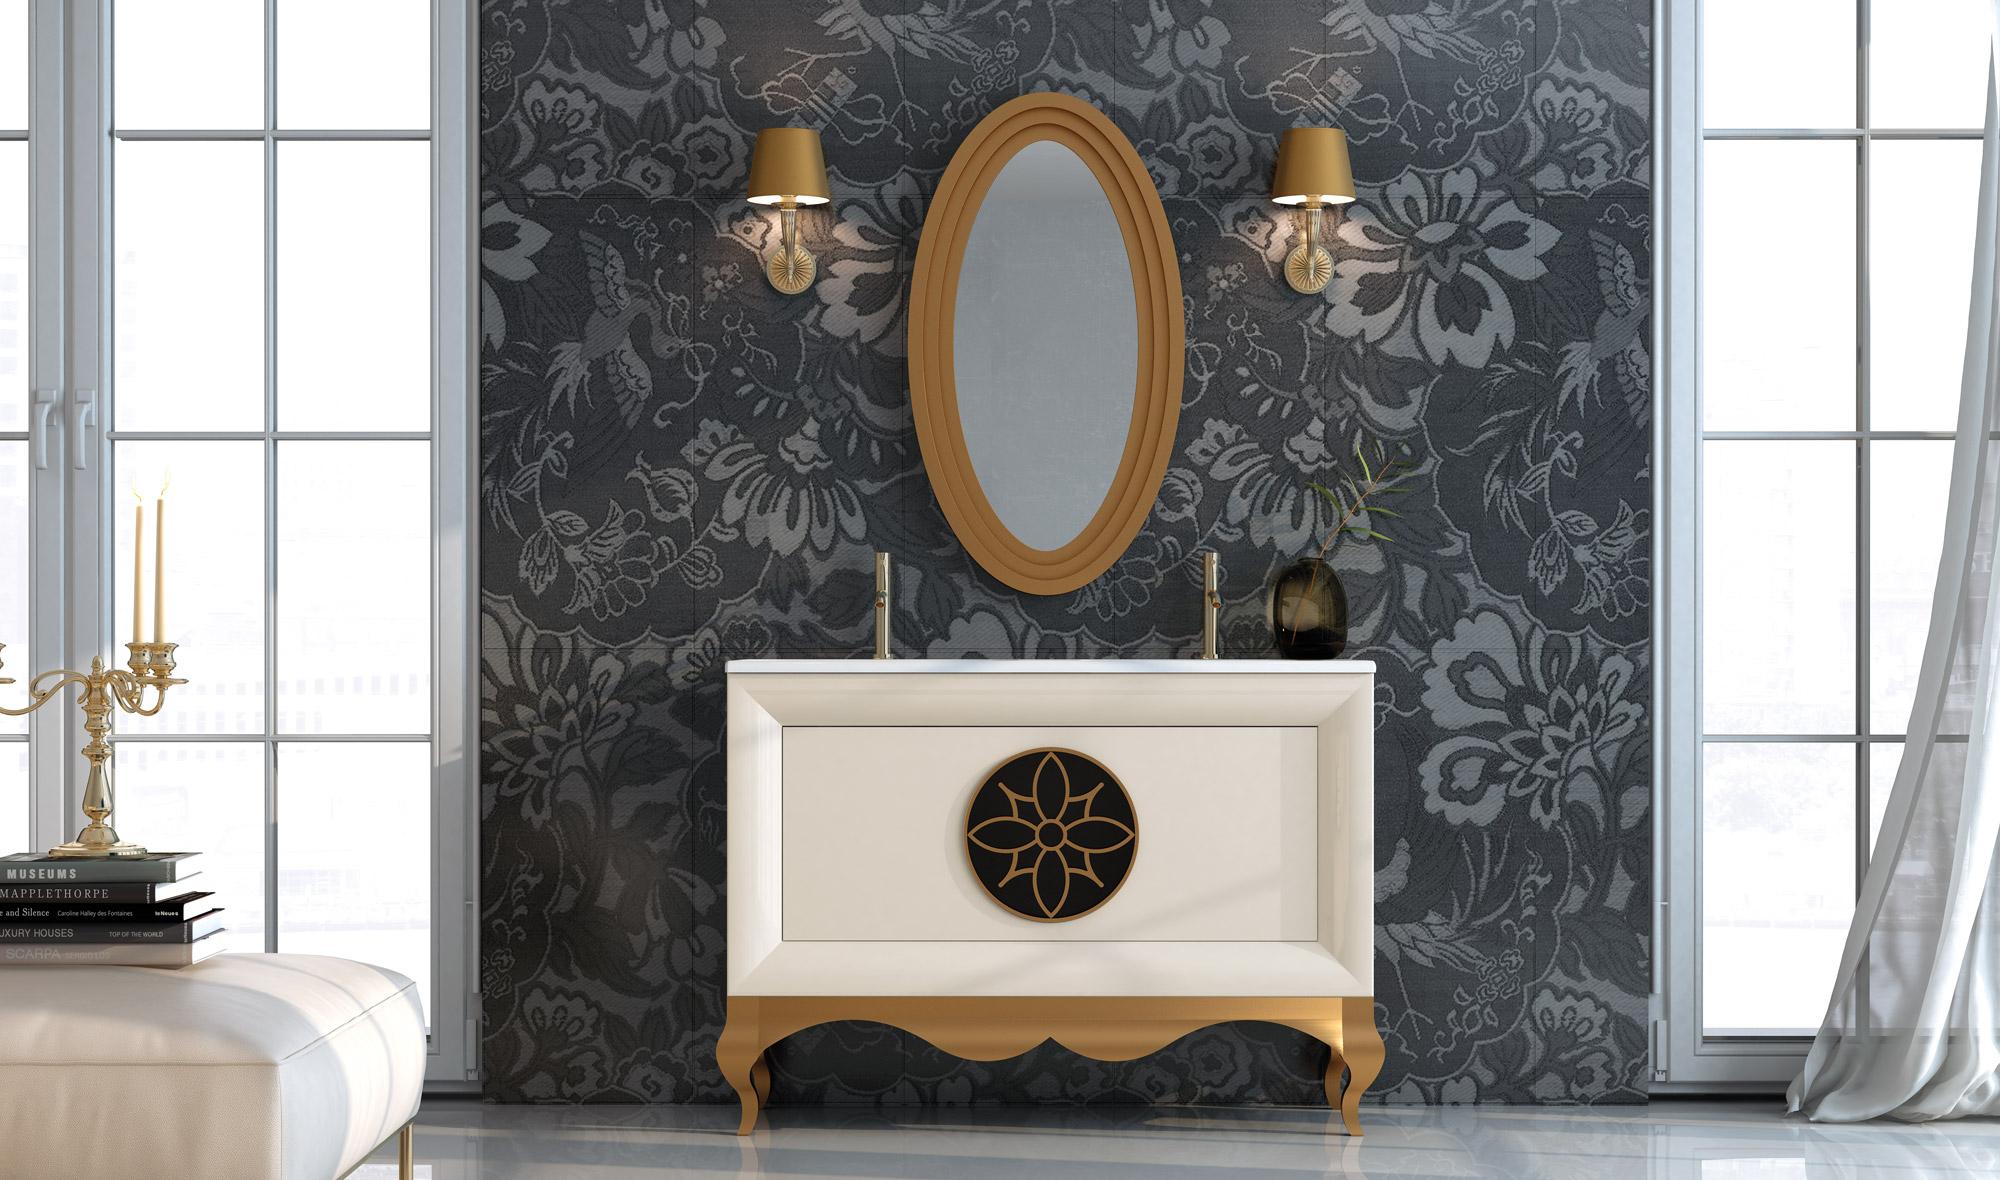 Muebles De Baño Nou Decor:Mueble de baño design Nisare en Portobellostreetes